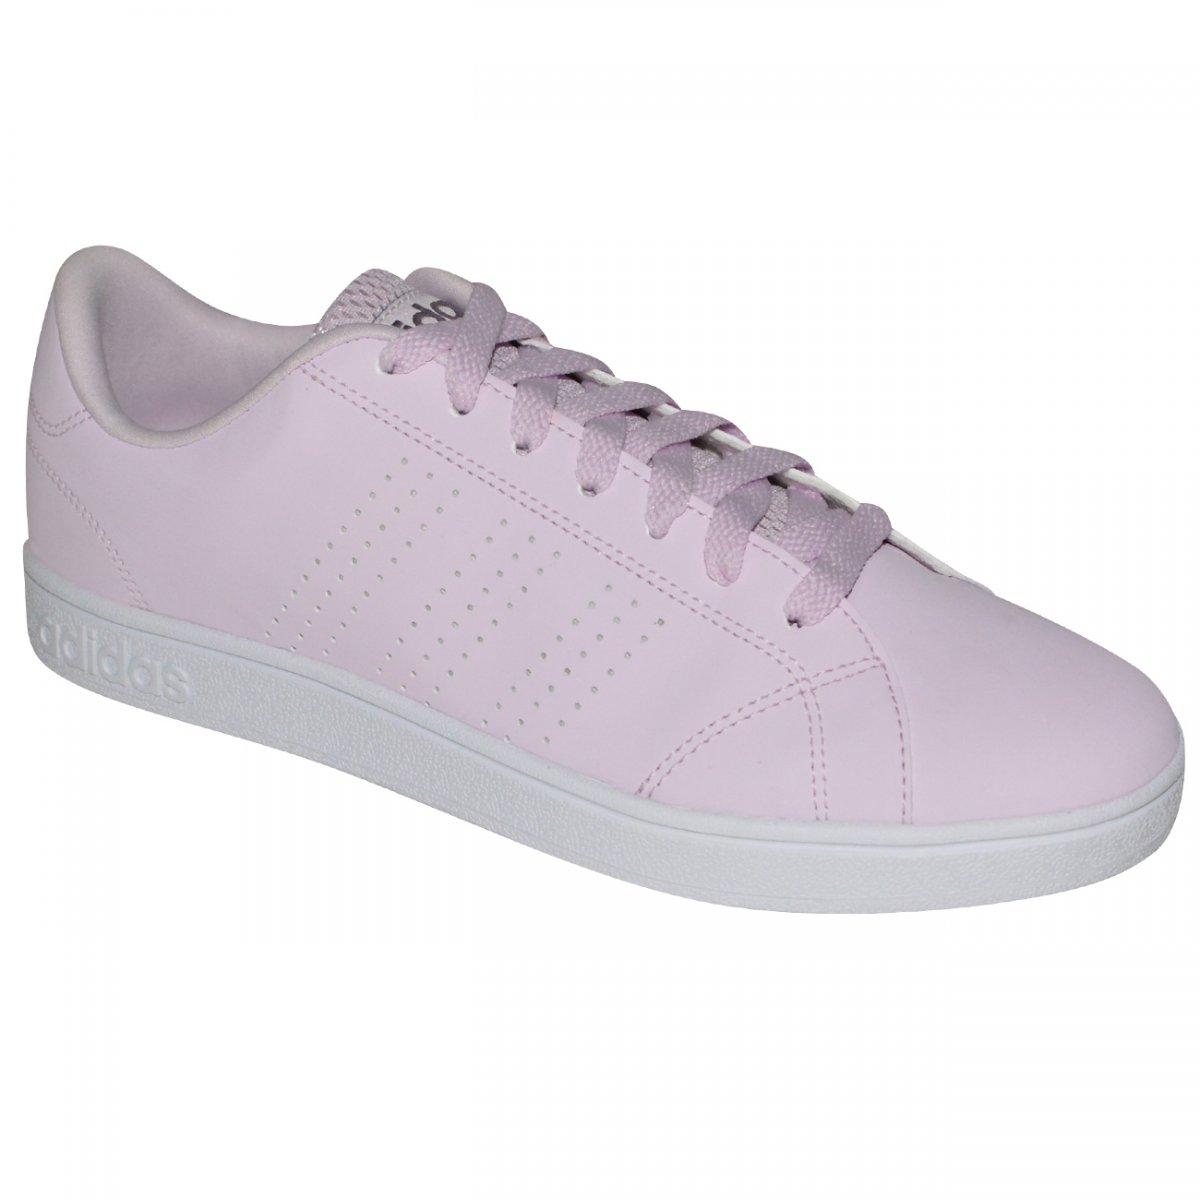 e11e2cdaa4 Tenis Adidas Advantage Clean DB0845 - Lilas branco - Chuteira Nike ...